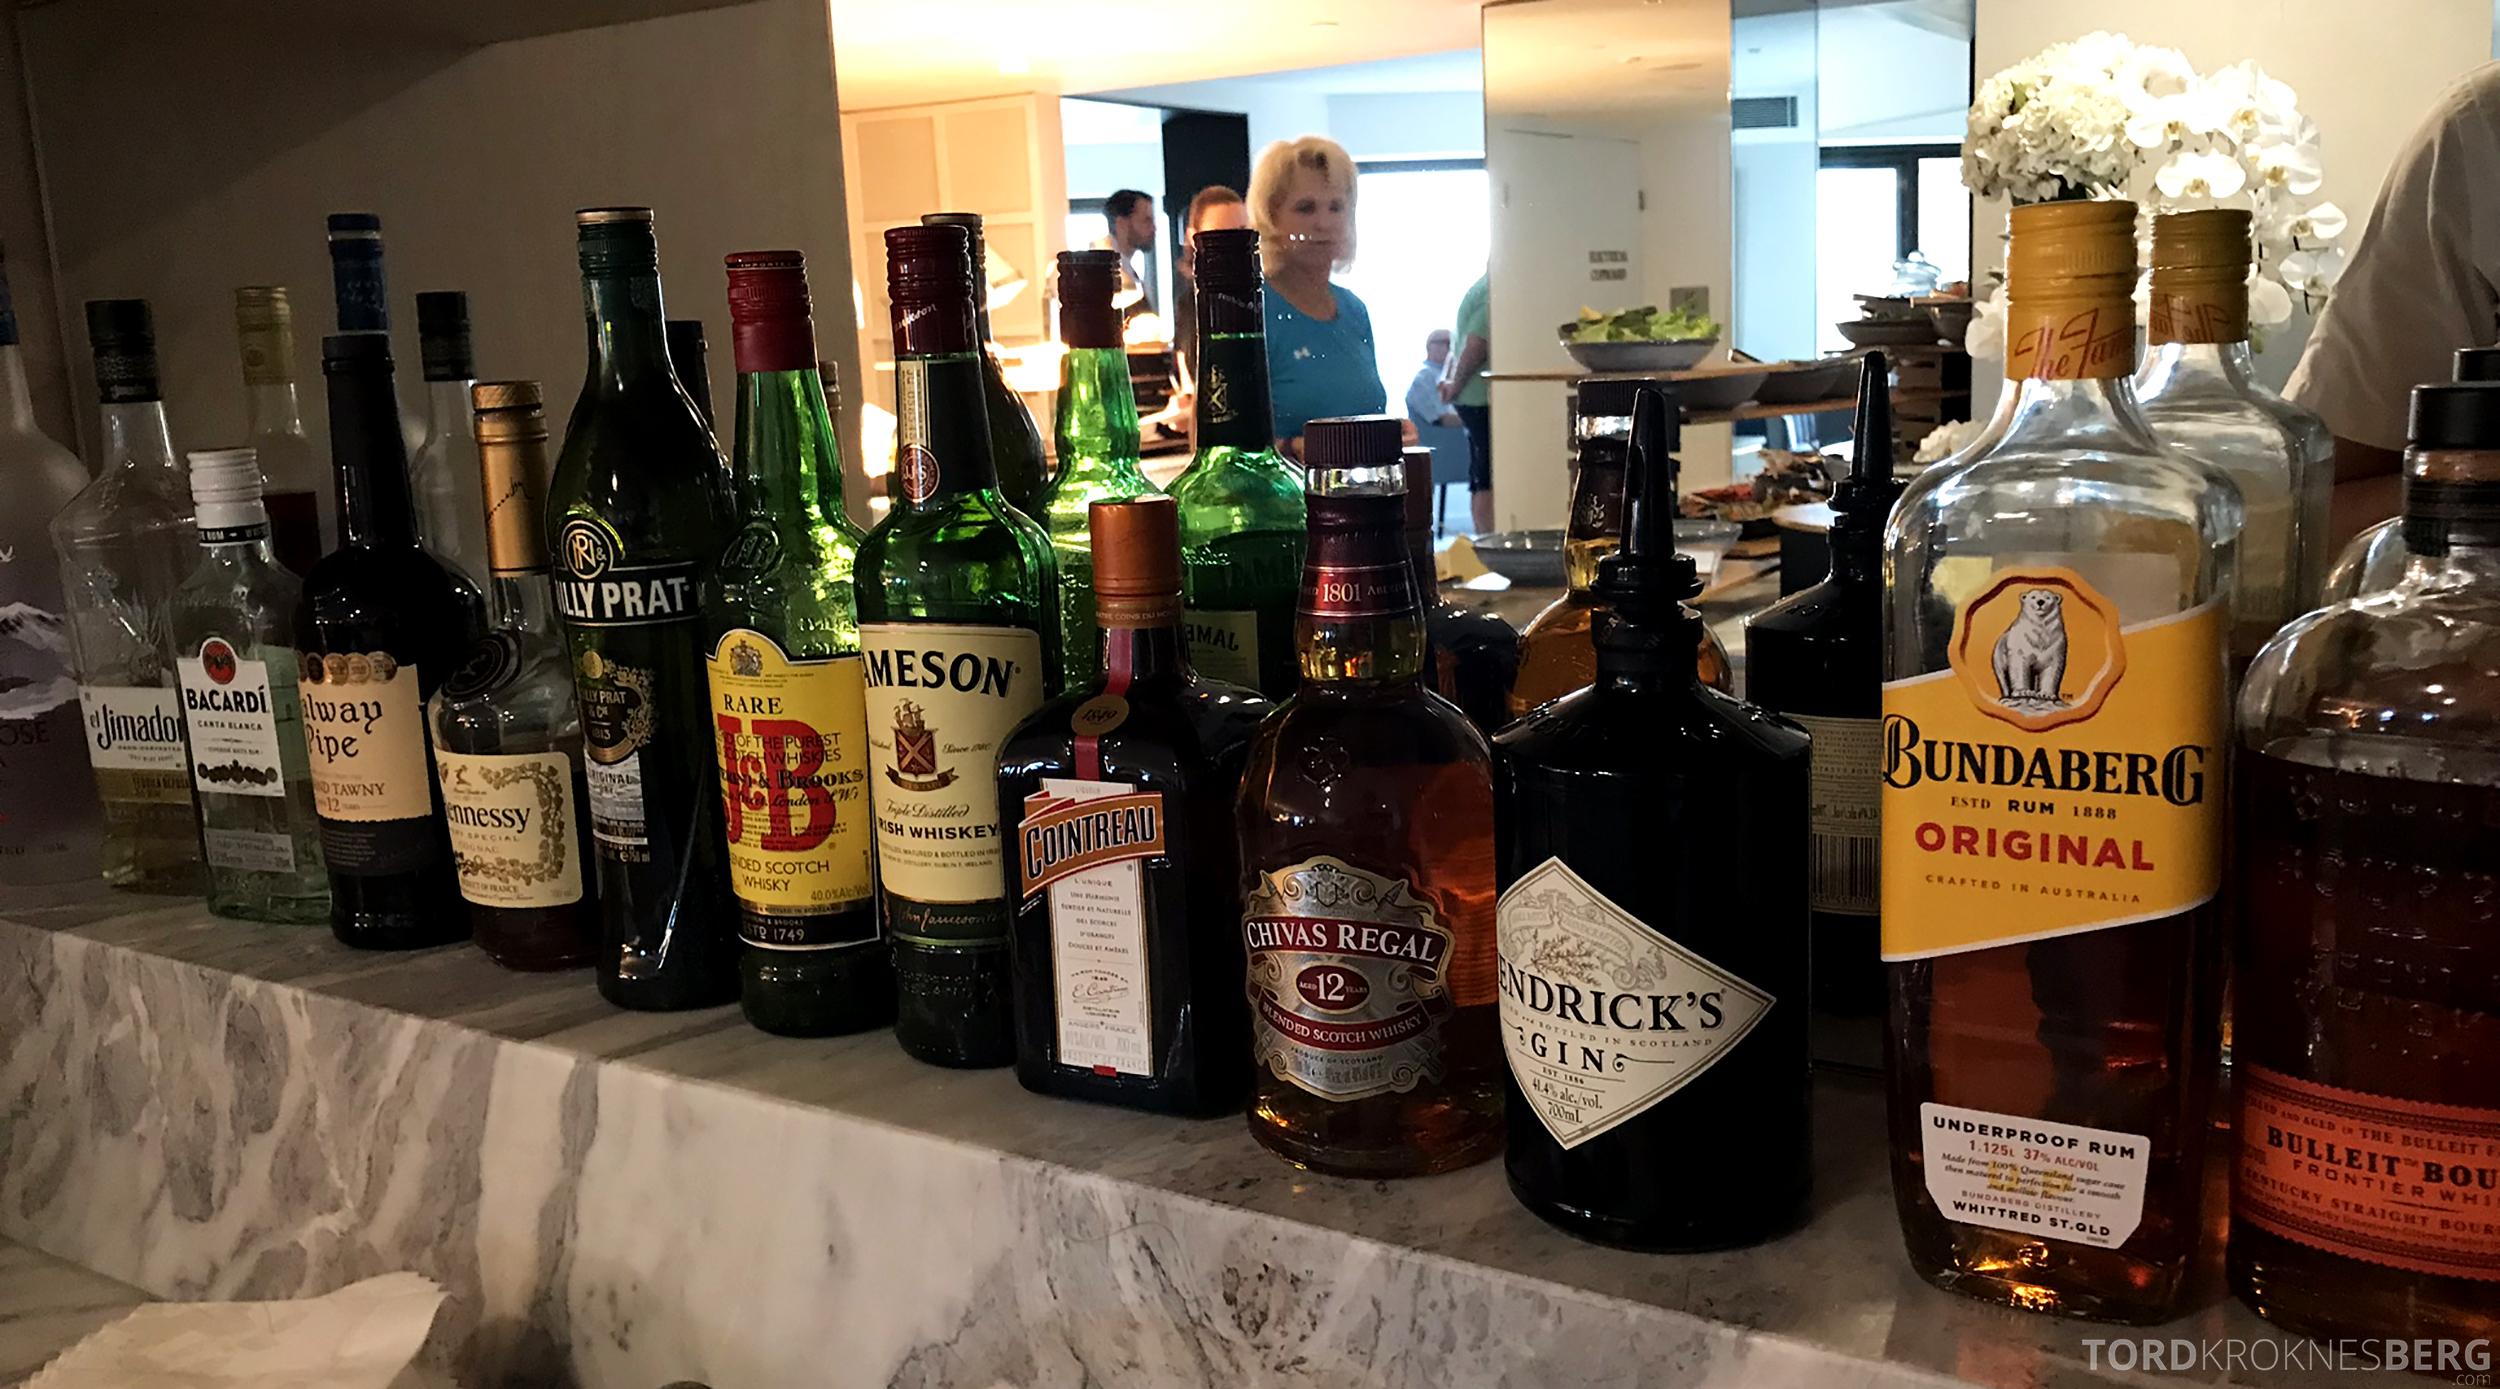 Four Seasons Hotel Sydney Lounge 32 hors d'oeuvre brennevin